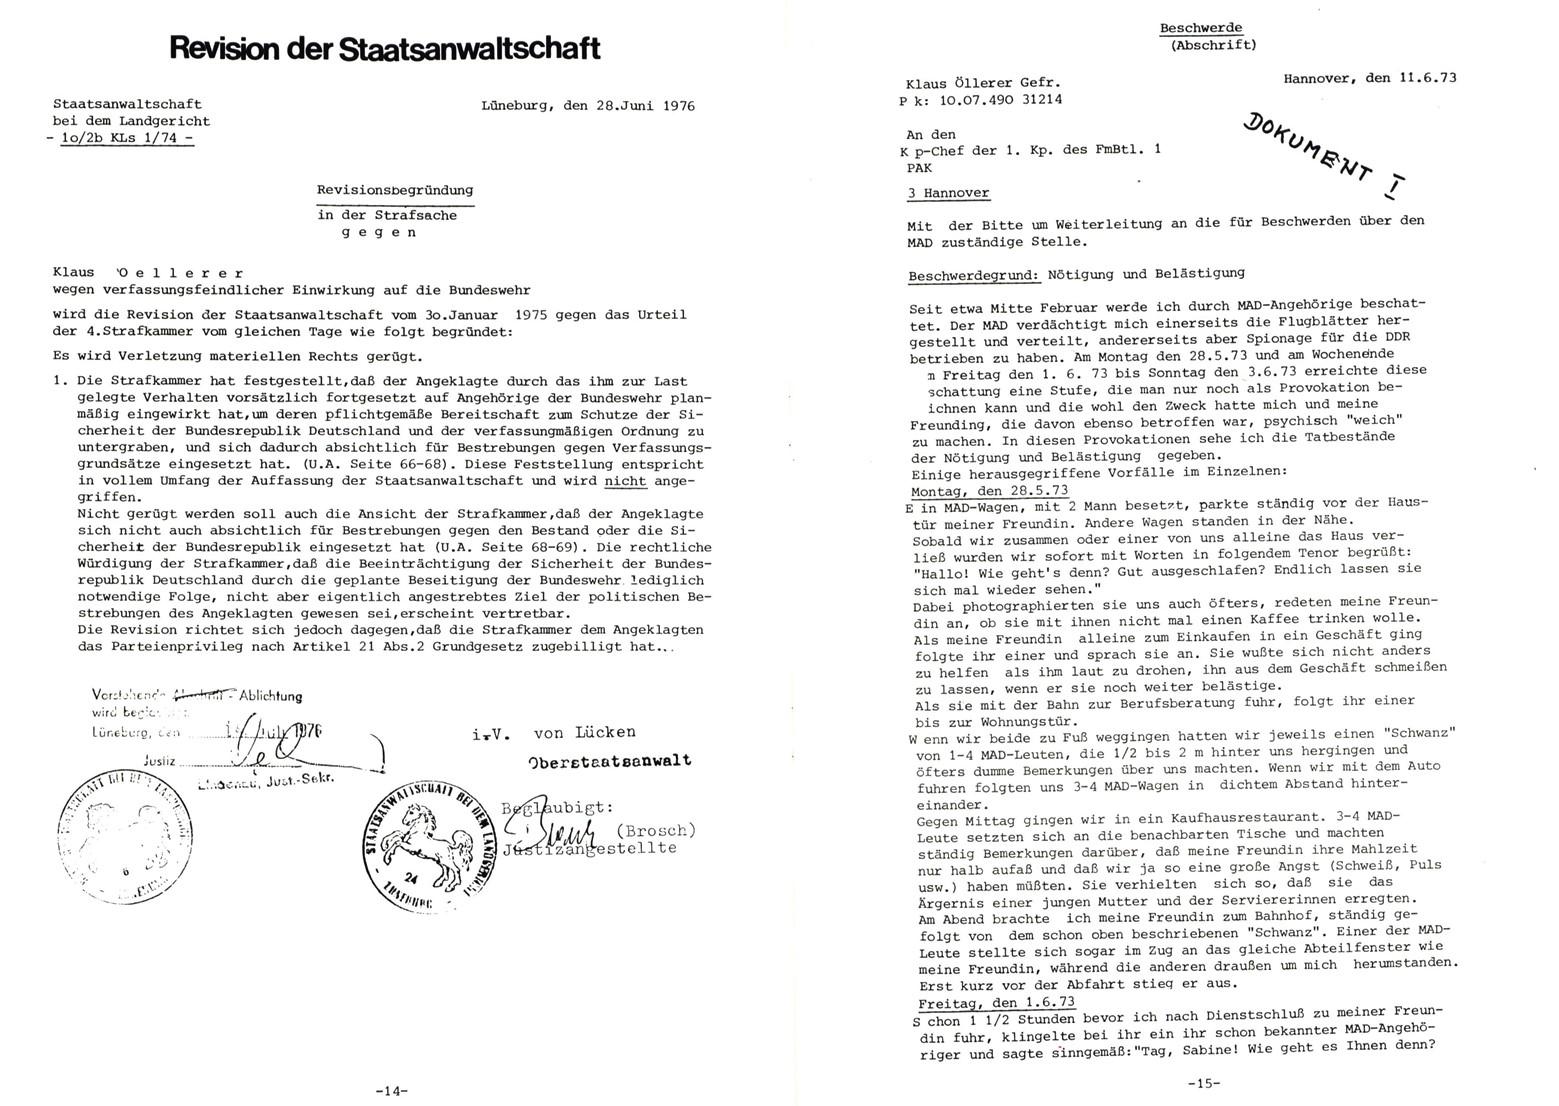 KPDAO_1976_Staatsschutzparagrafen_08